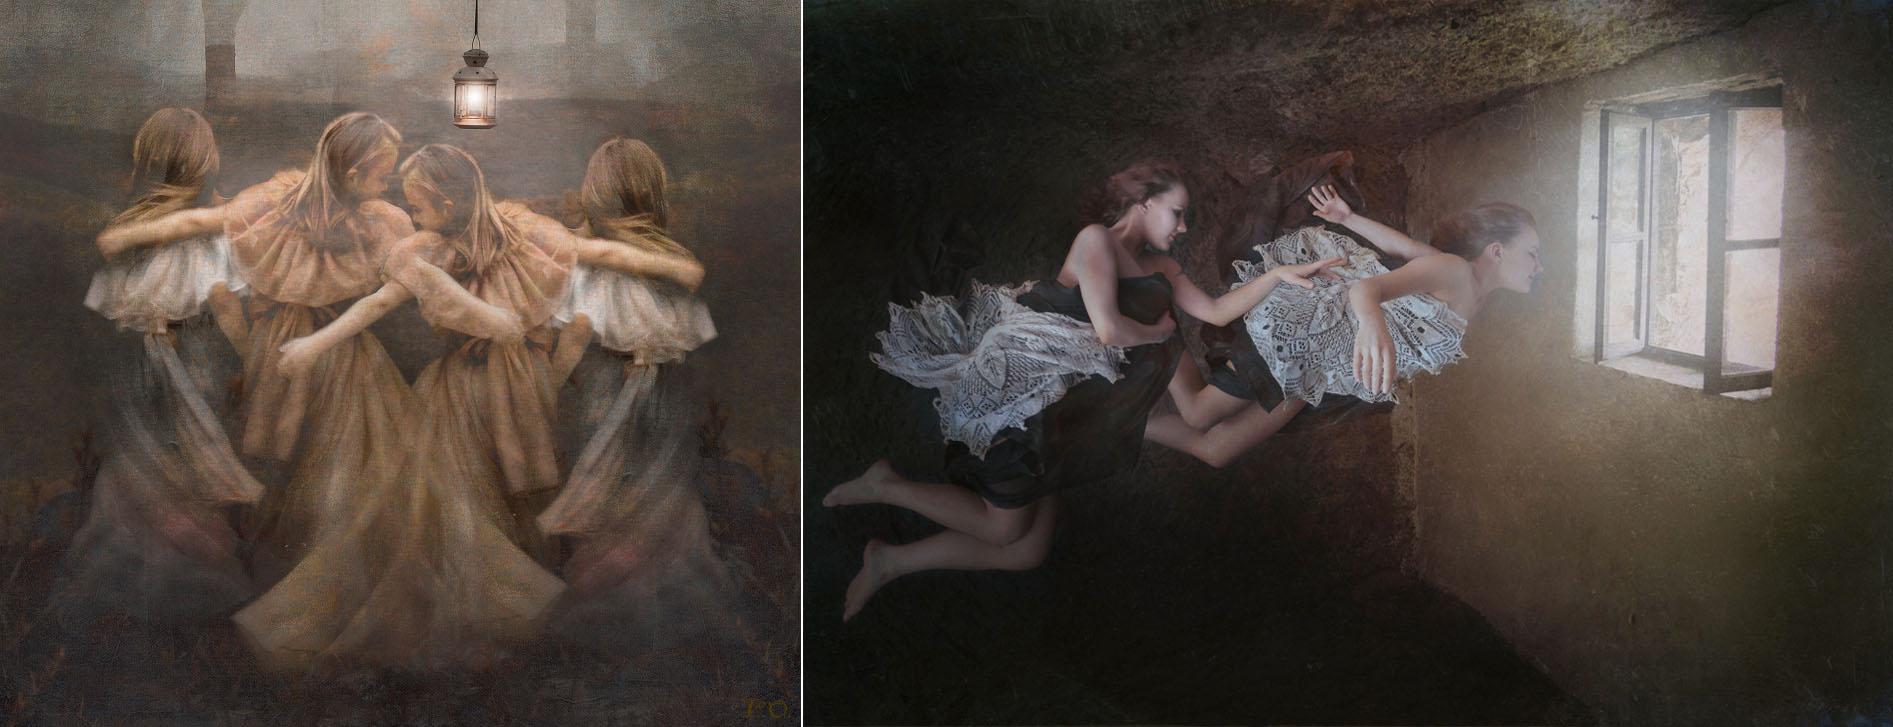 © Veronika Otepková / Robert Vano Gallery